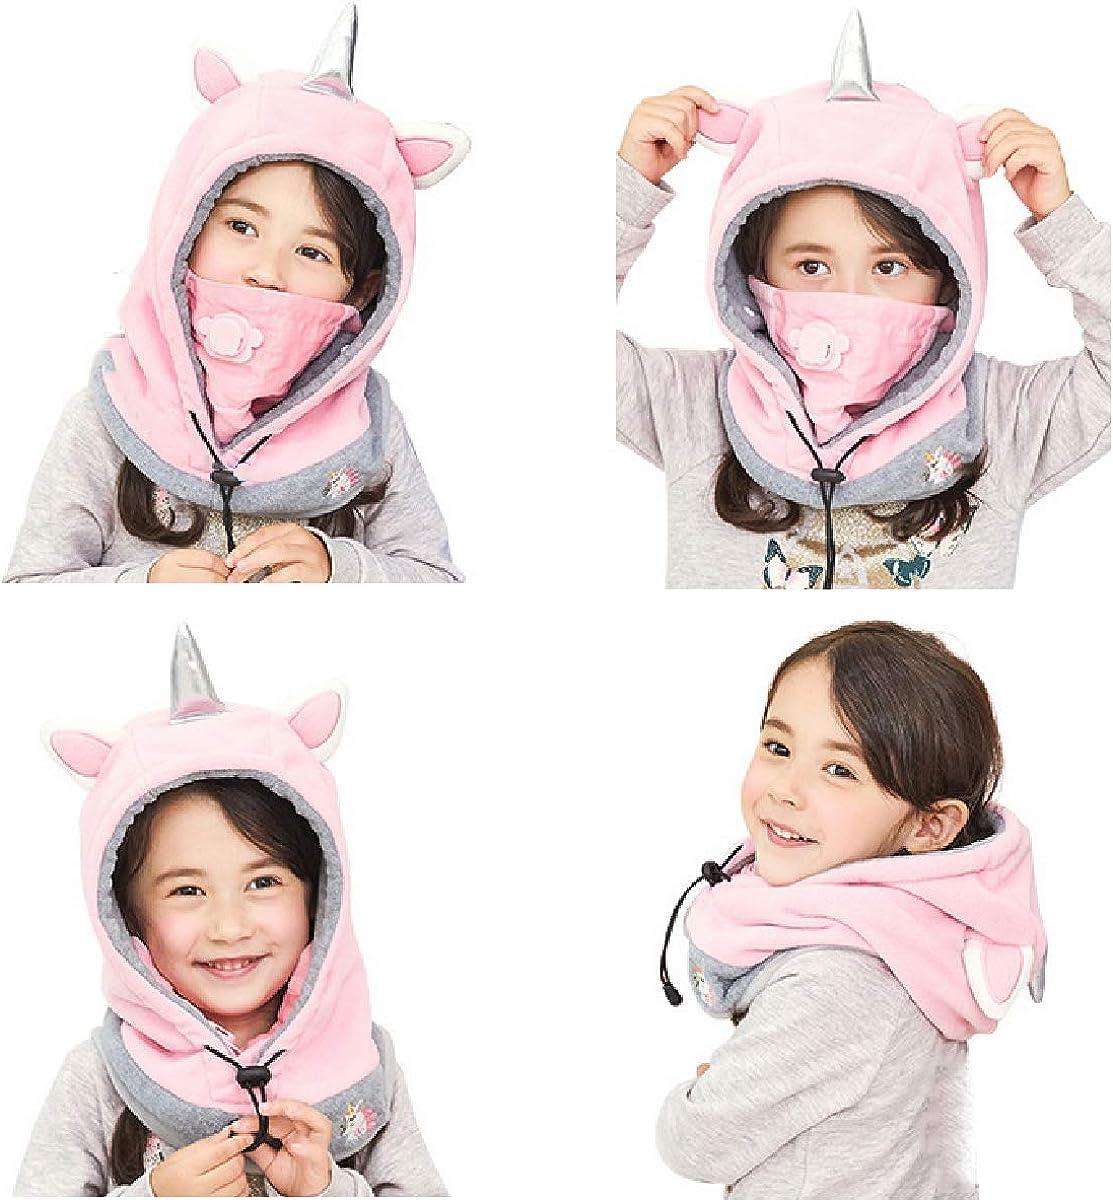 TRIWONDER Kids Balaclava Face Mask Fleece Ski Mask Neck Warmer Nose Warmer Face Cover Winter Animal Hood Hat for Boys Girls (Pink - Unicorn) : Clothing, Shoes & Jewelry